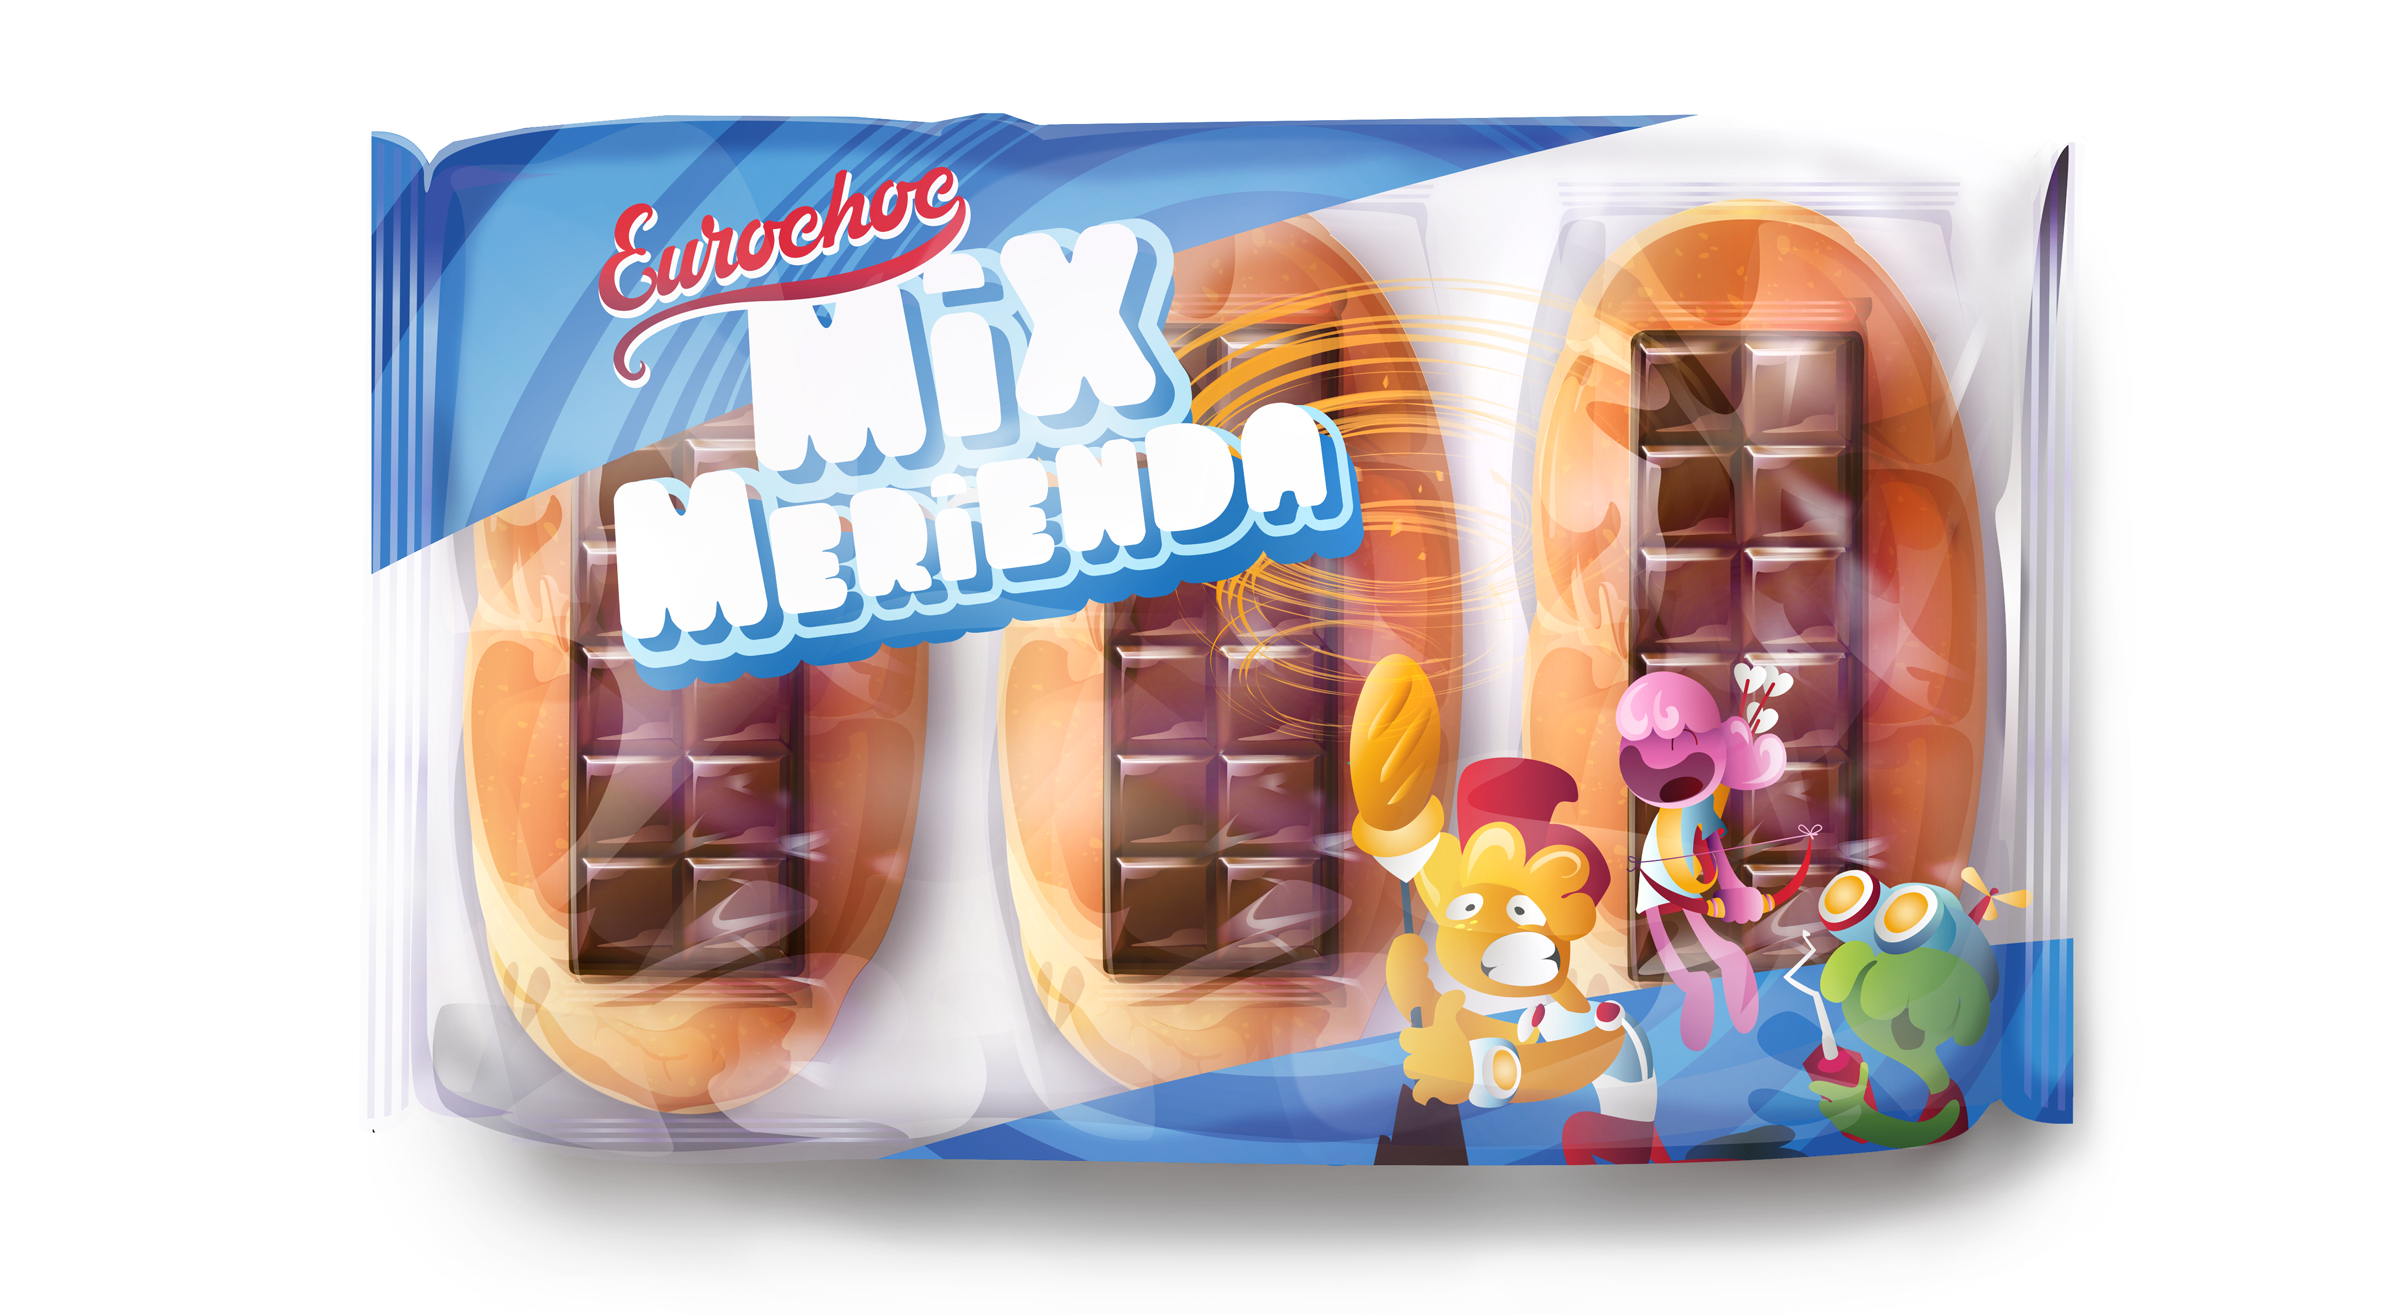 grande-web-1-mix-merienda